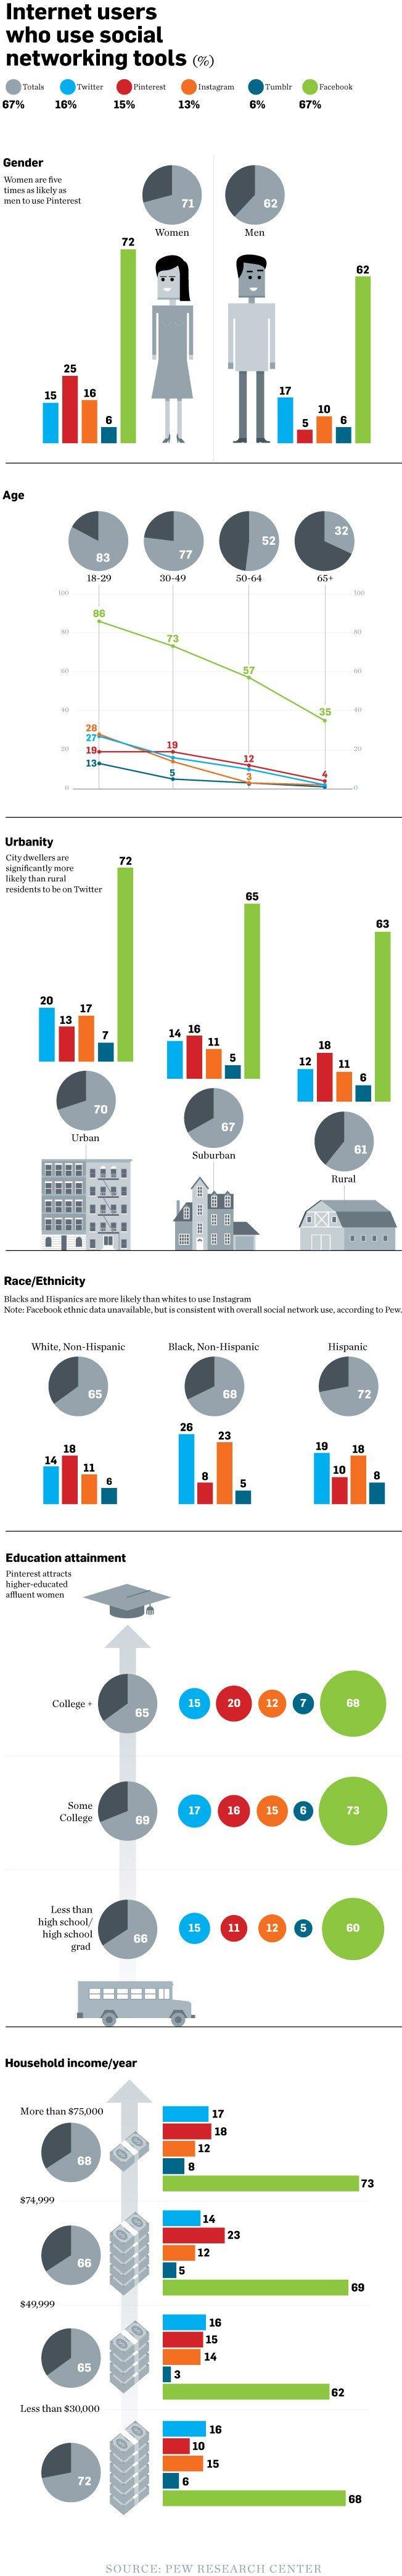 social media demographics in 2013